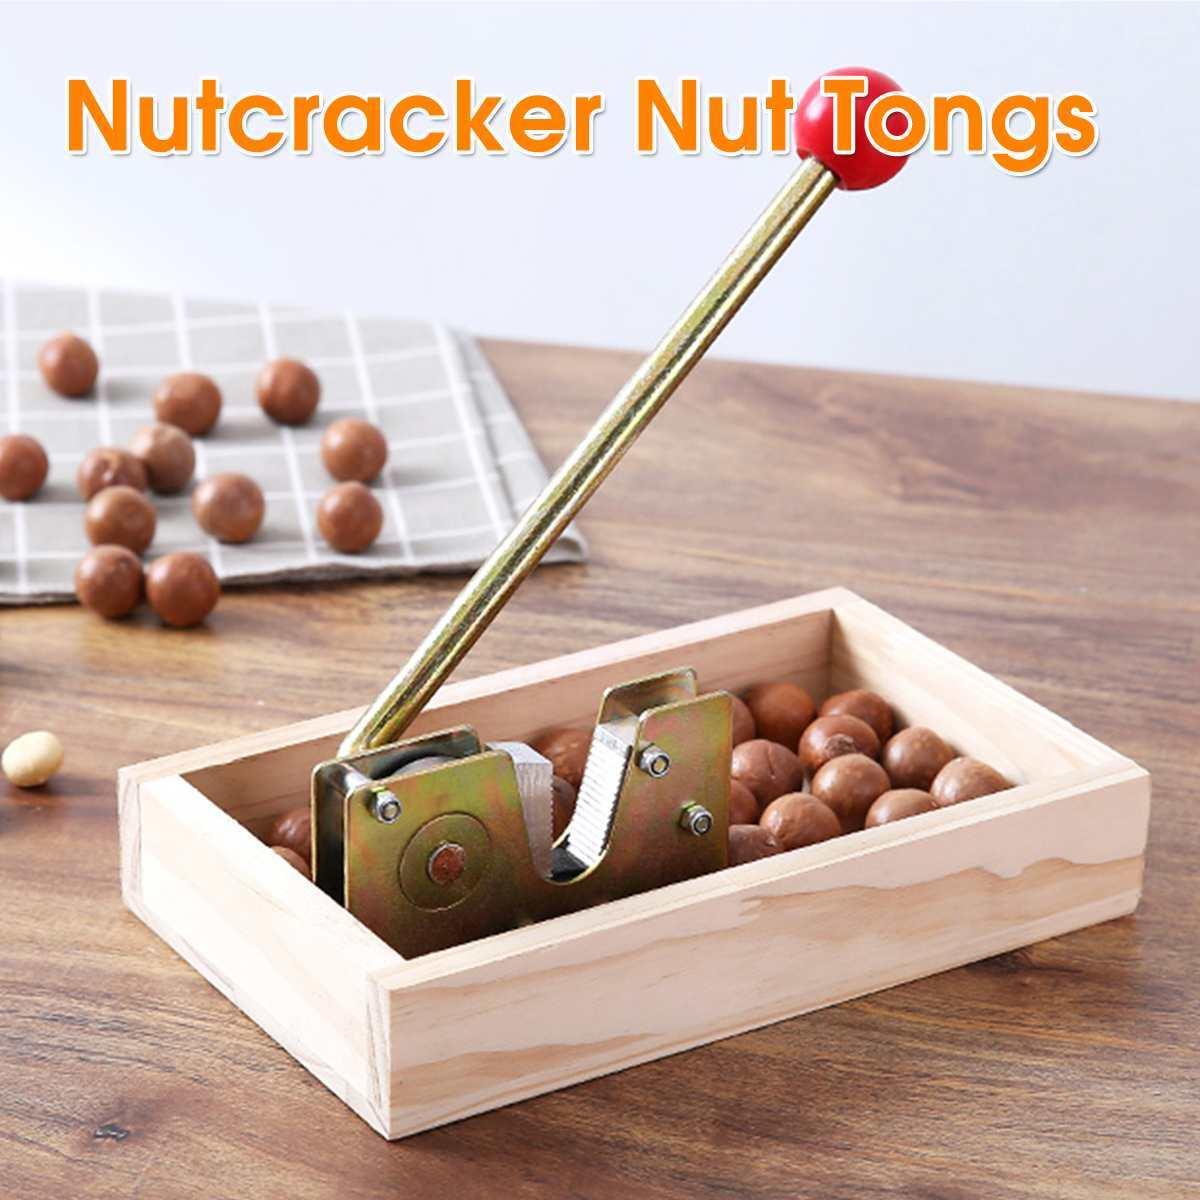 Nutcracker Nut Tongs Walnuts Heavy Duty Macadamia Opener Peeling Machine with Durable Metal Handle for Hazelnuts Almonds